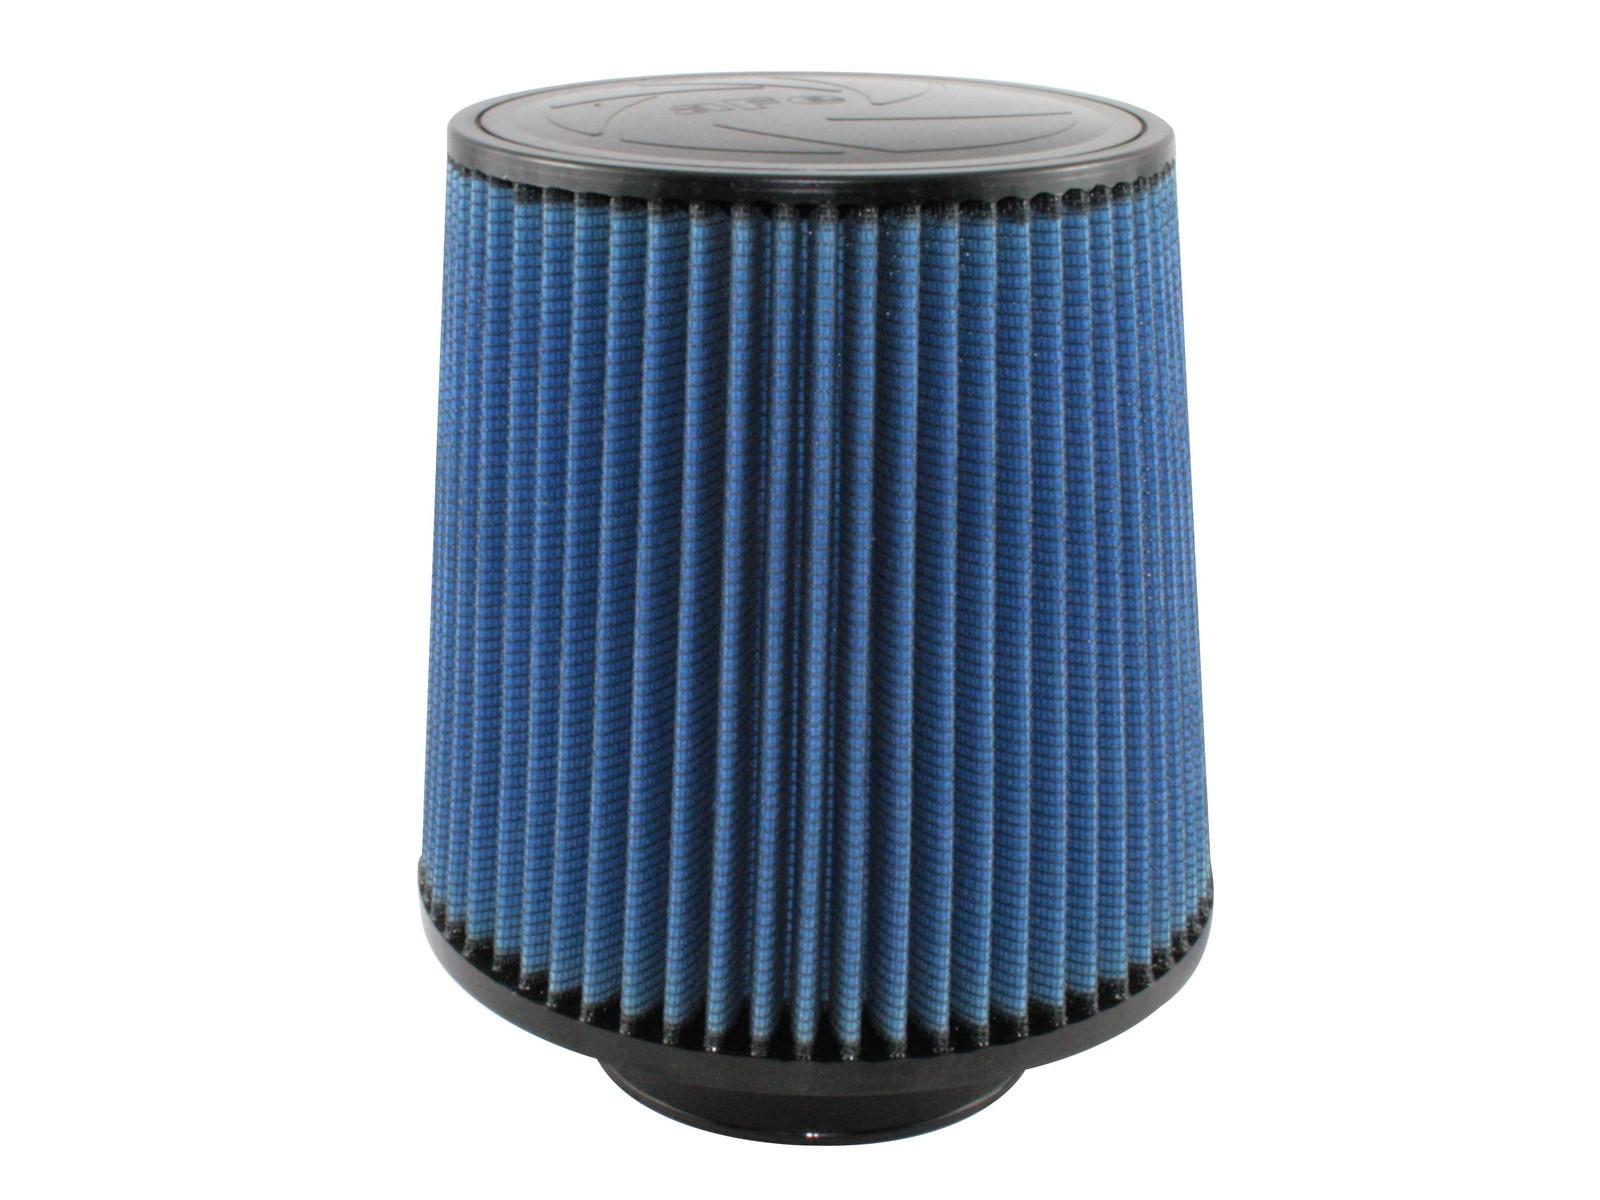 aFe POWER 24-90010 Magnum FLOW Pro 5R Air Filter